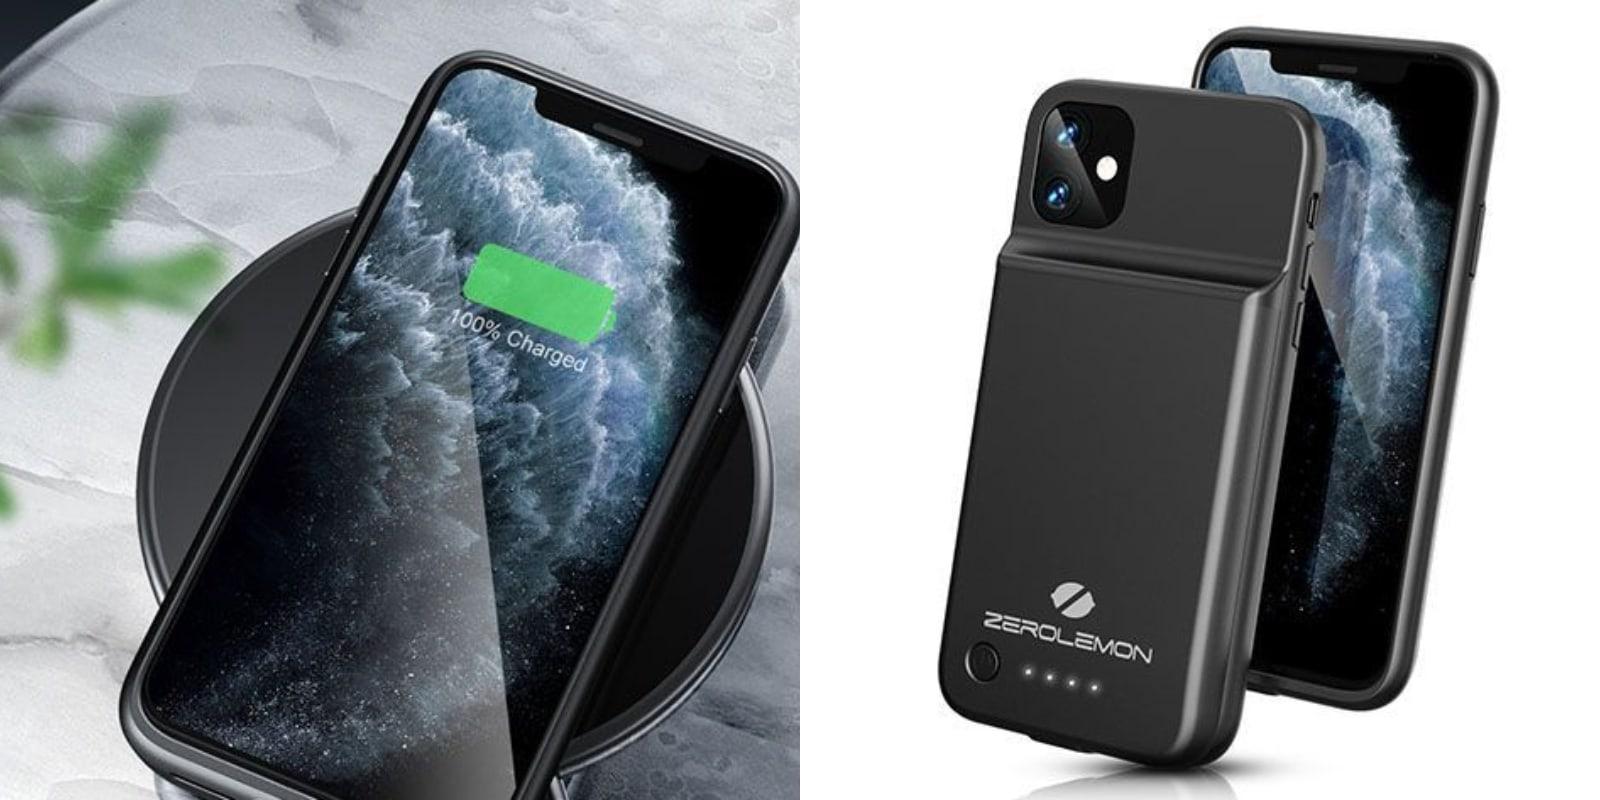 iPhone 11 Charging Case